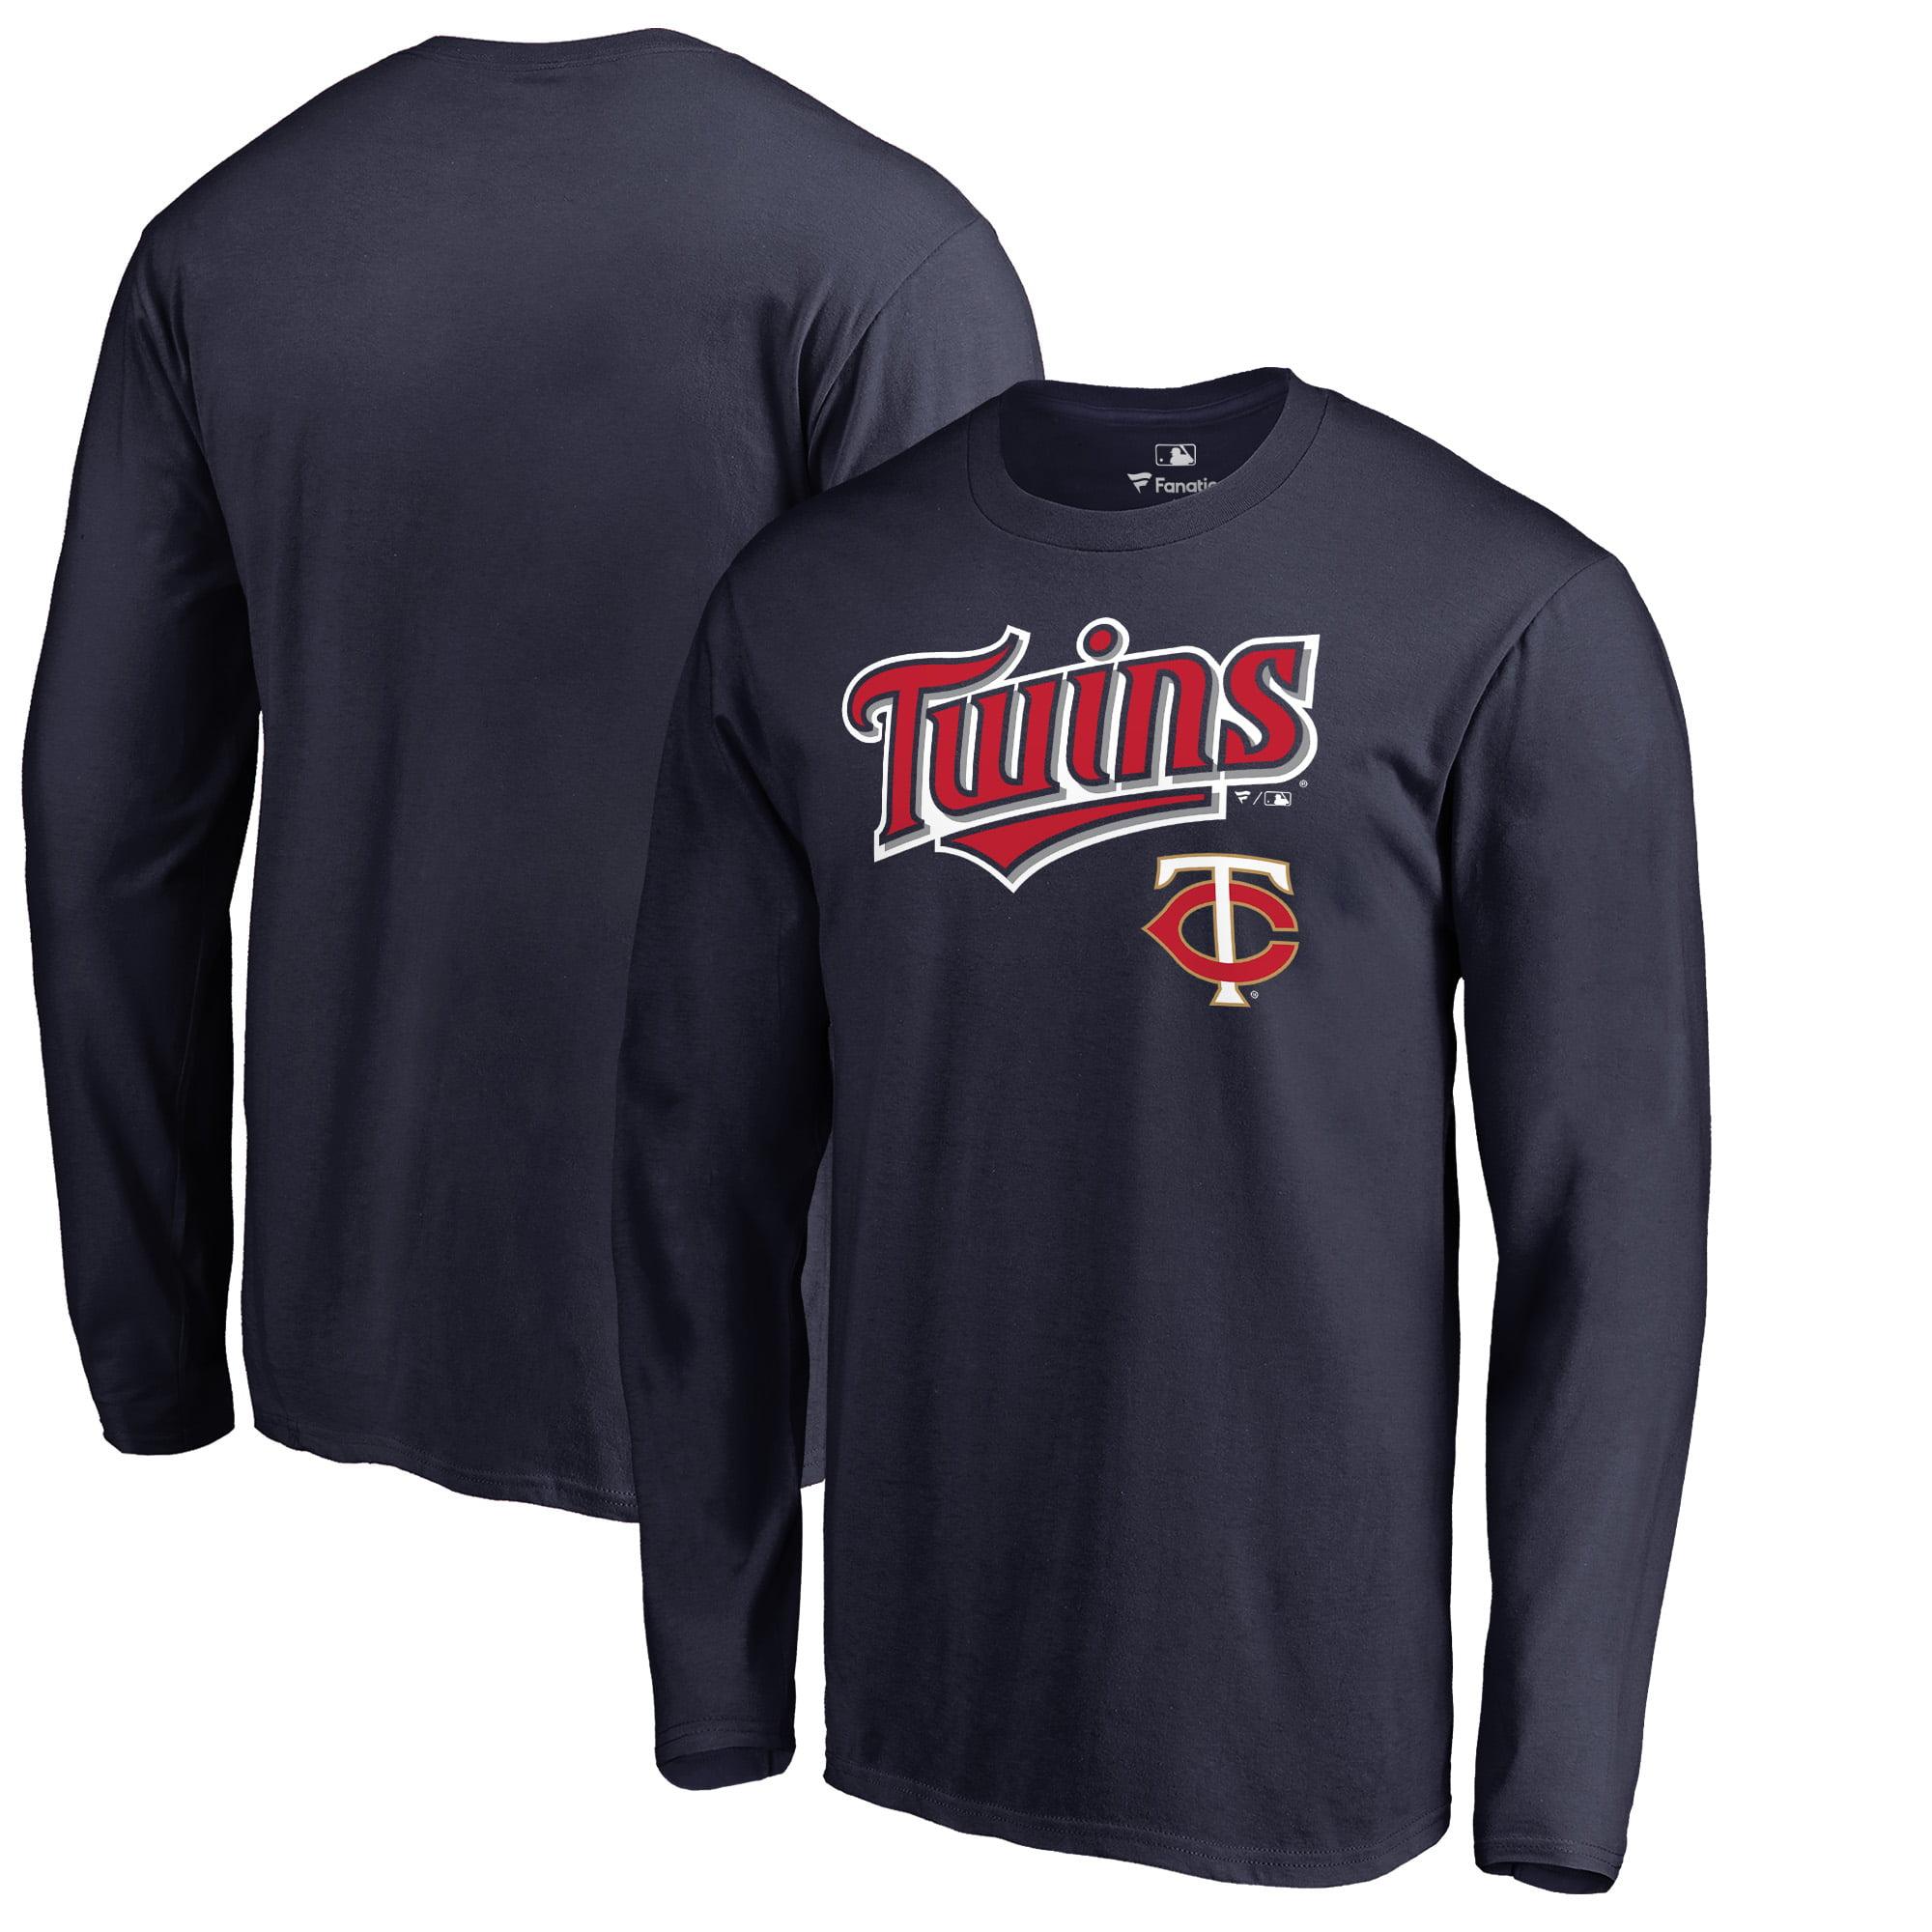 Minnesota Twins Fanatics Branded Team Lockup Long Sleeve T-Shirt - Navy